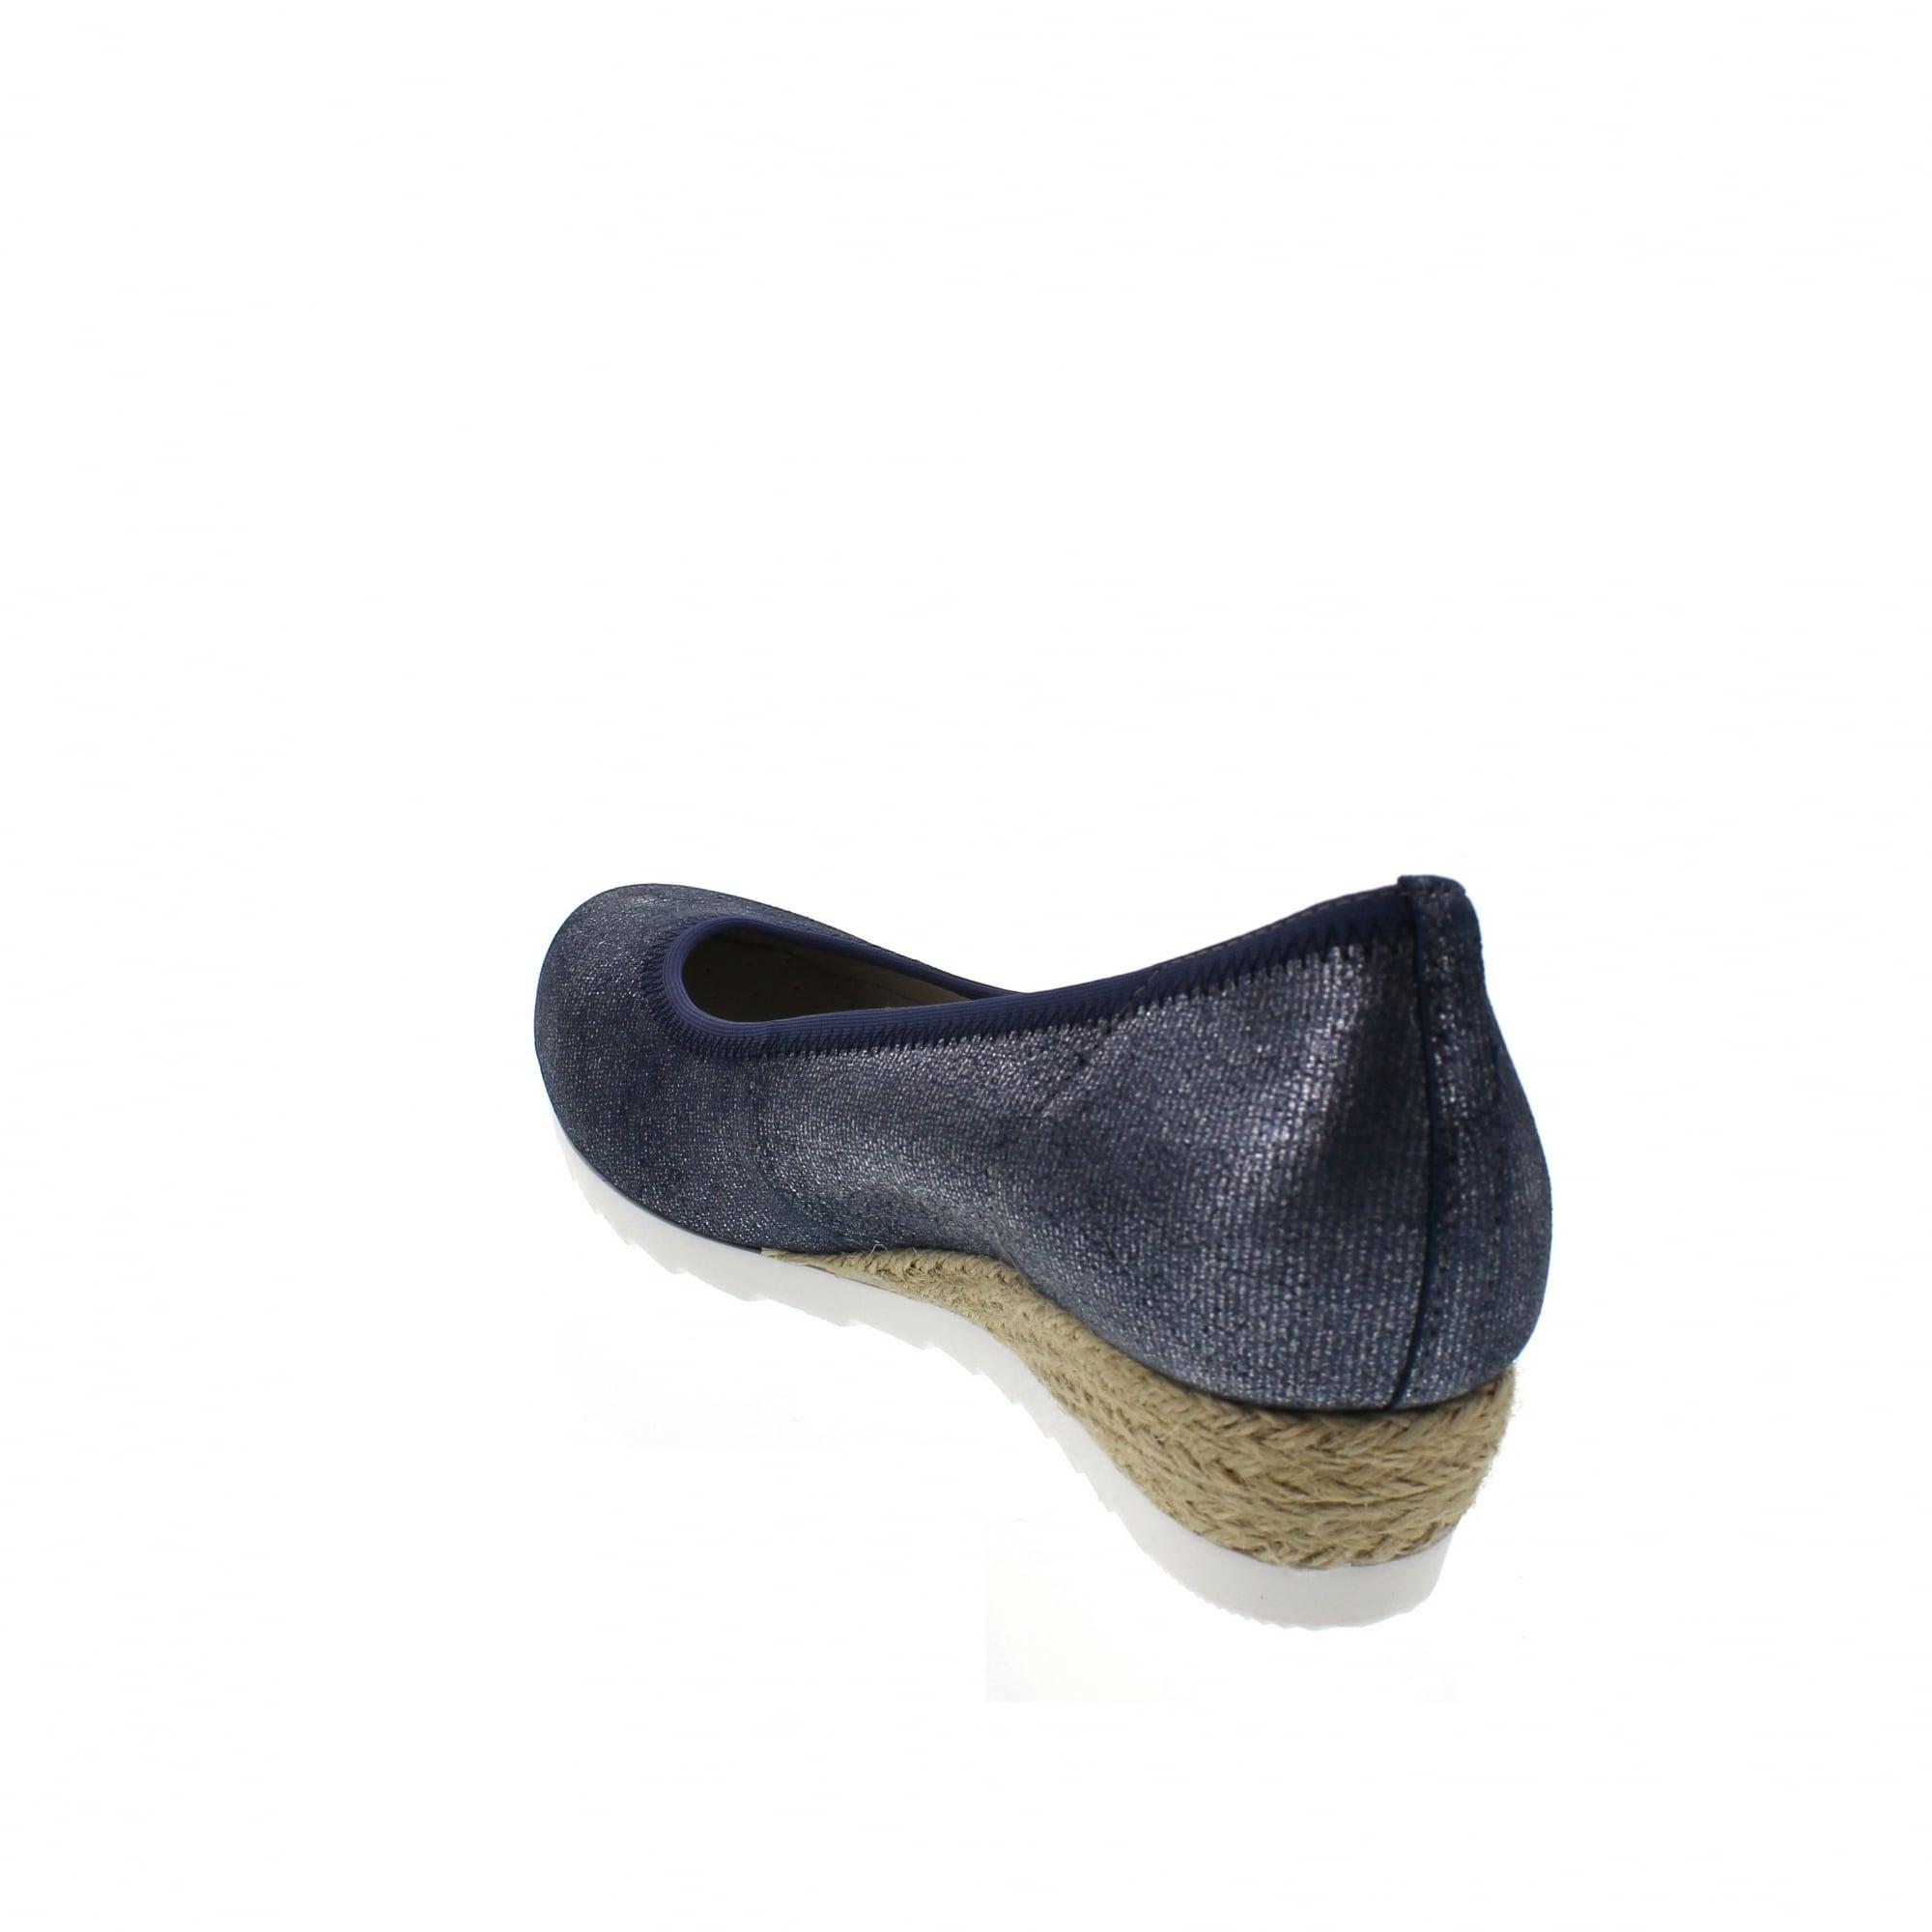 3171ca077 Gabor Epworth 82-641-86 Denim/Silver Womens Wedge Pumps | Rogerson Shoes